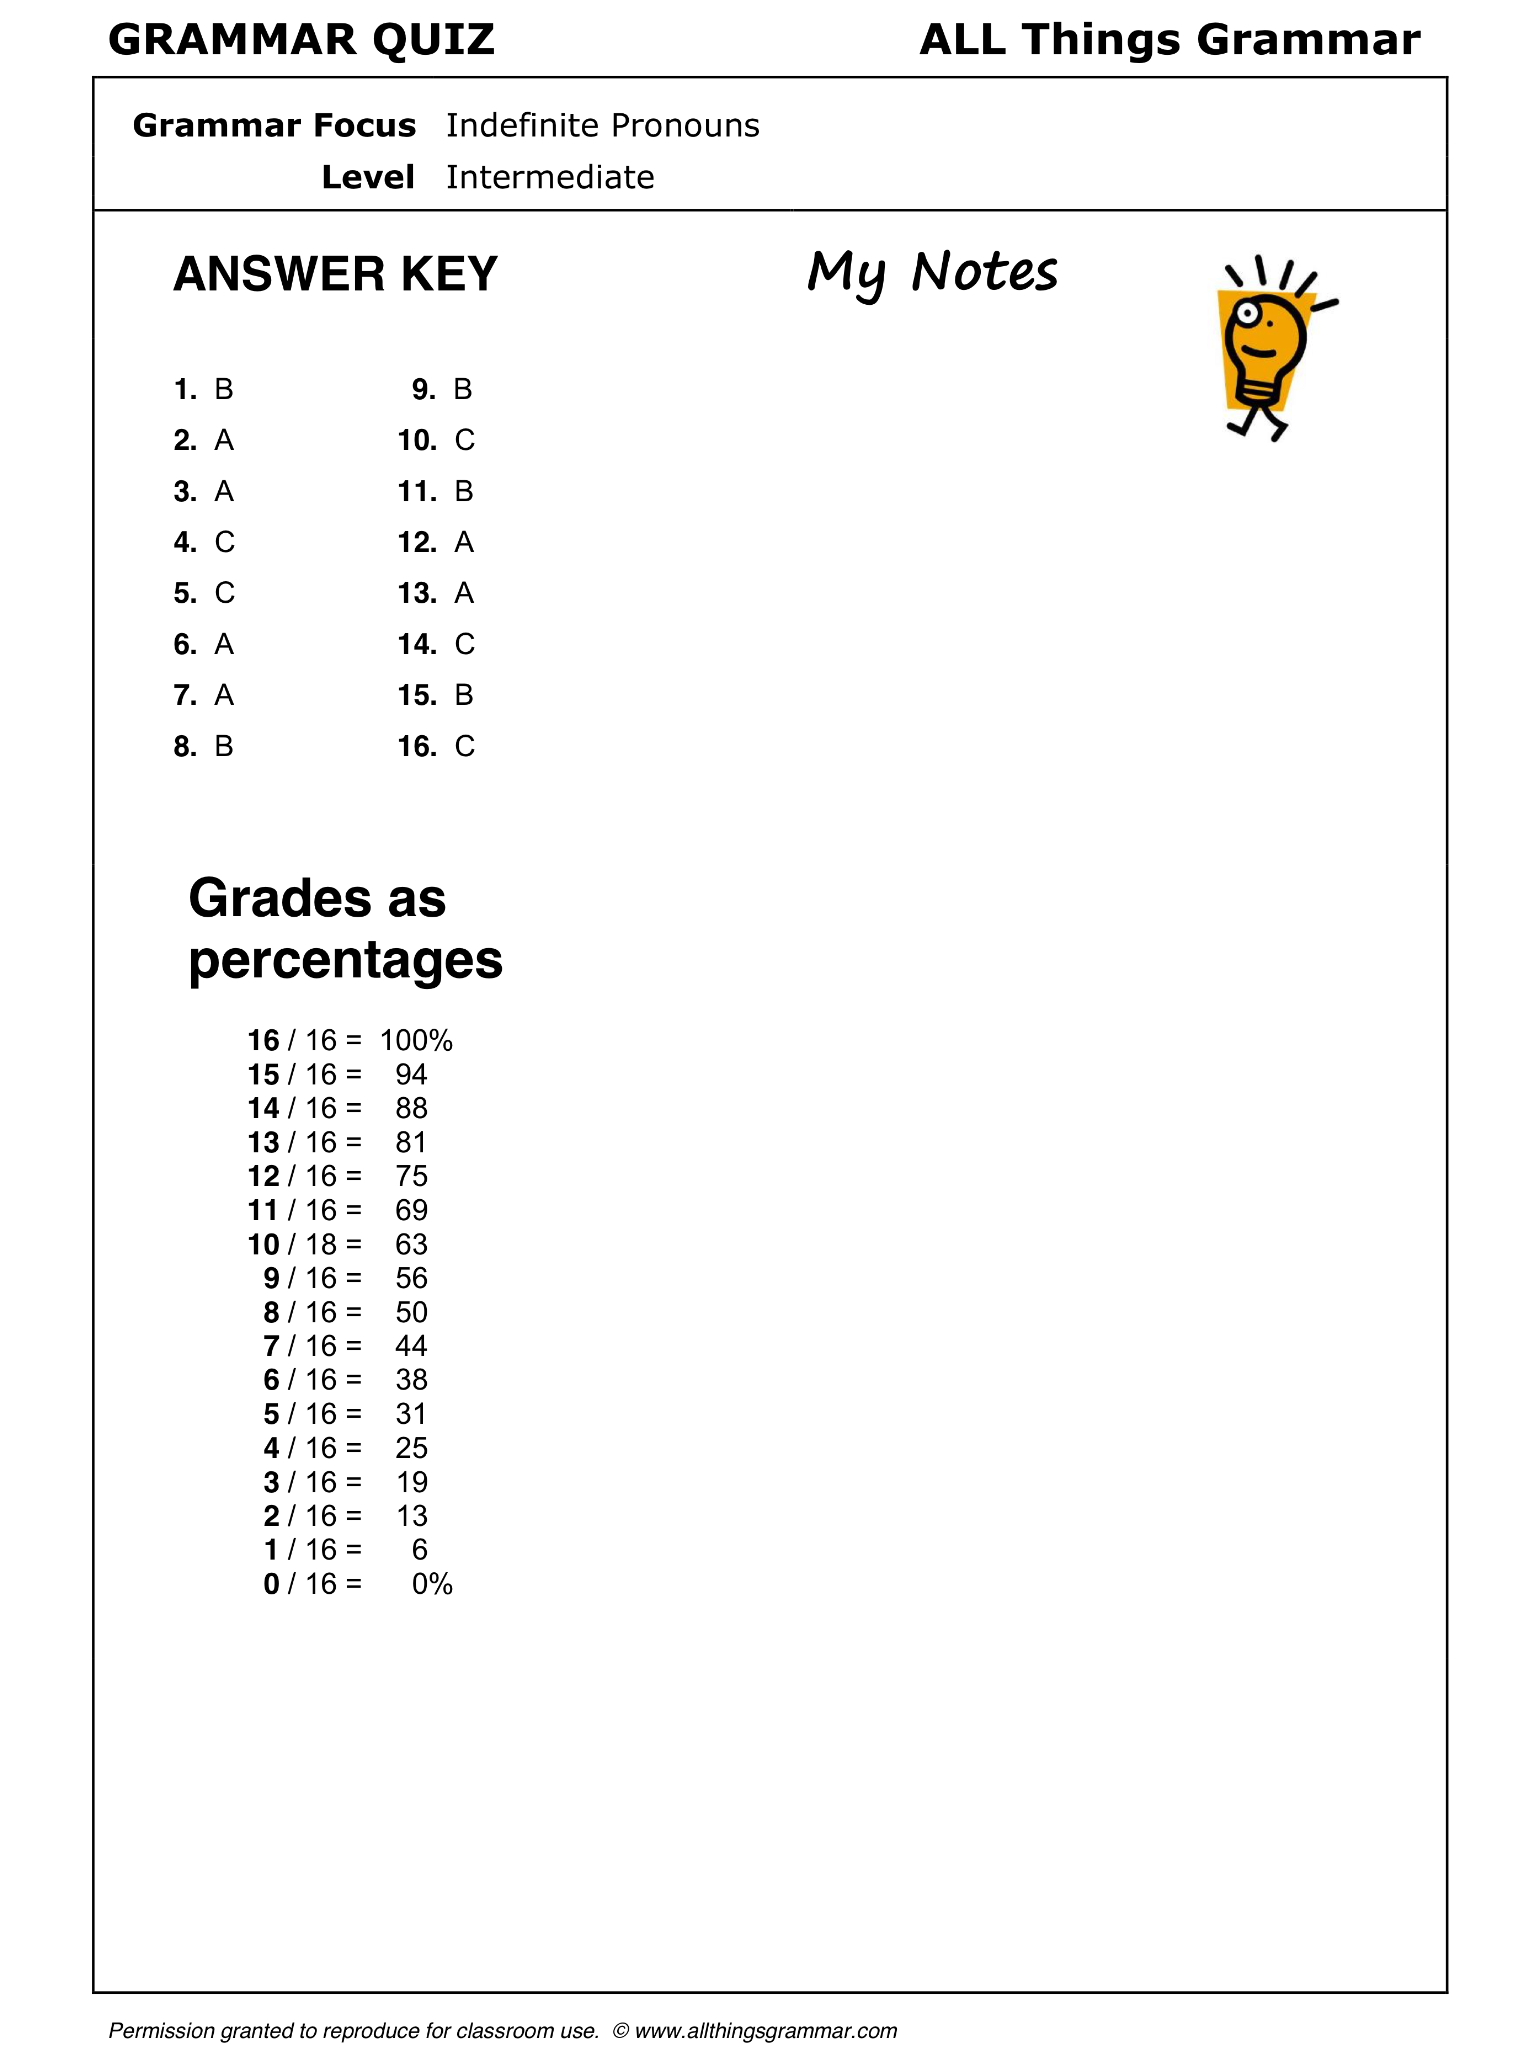 English Grammar Quiz Indefinite Pronouns